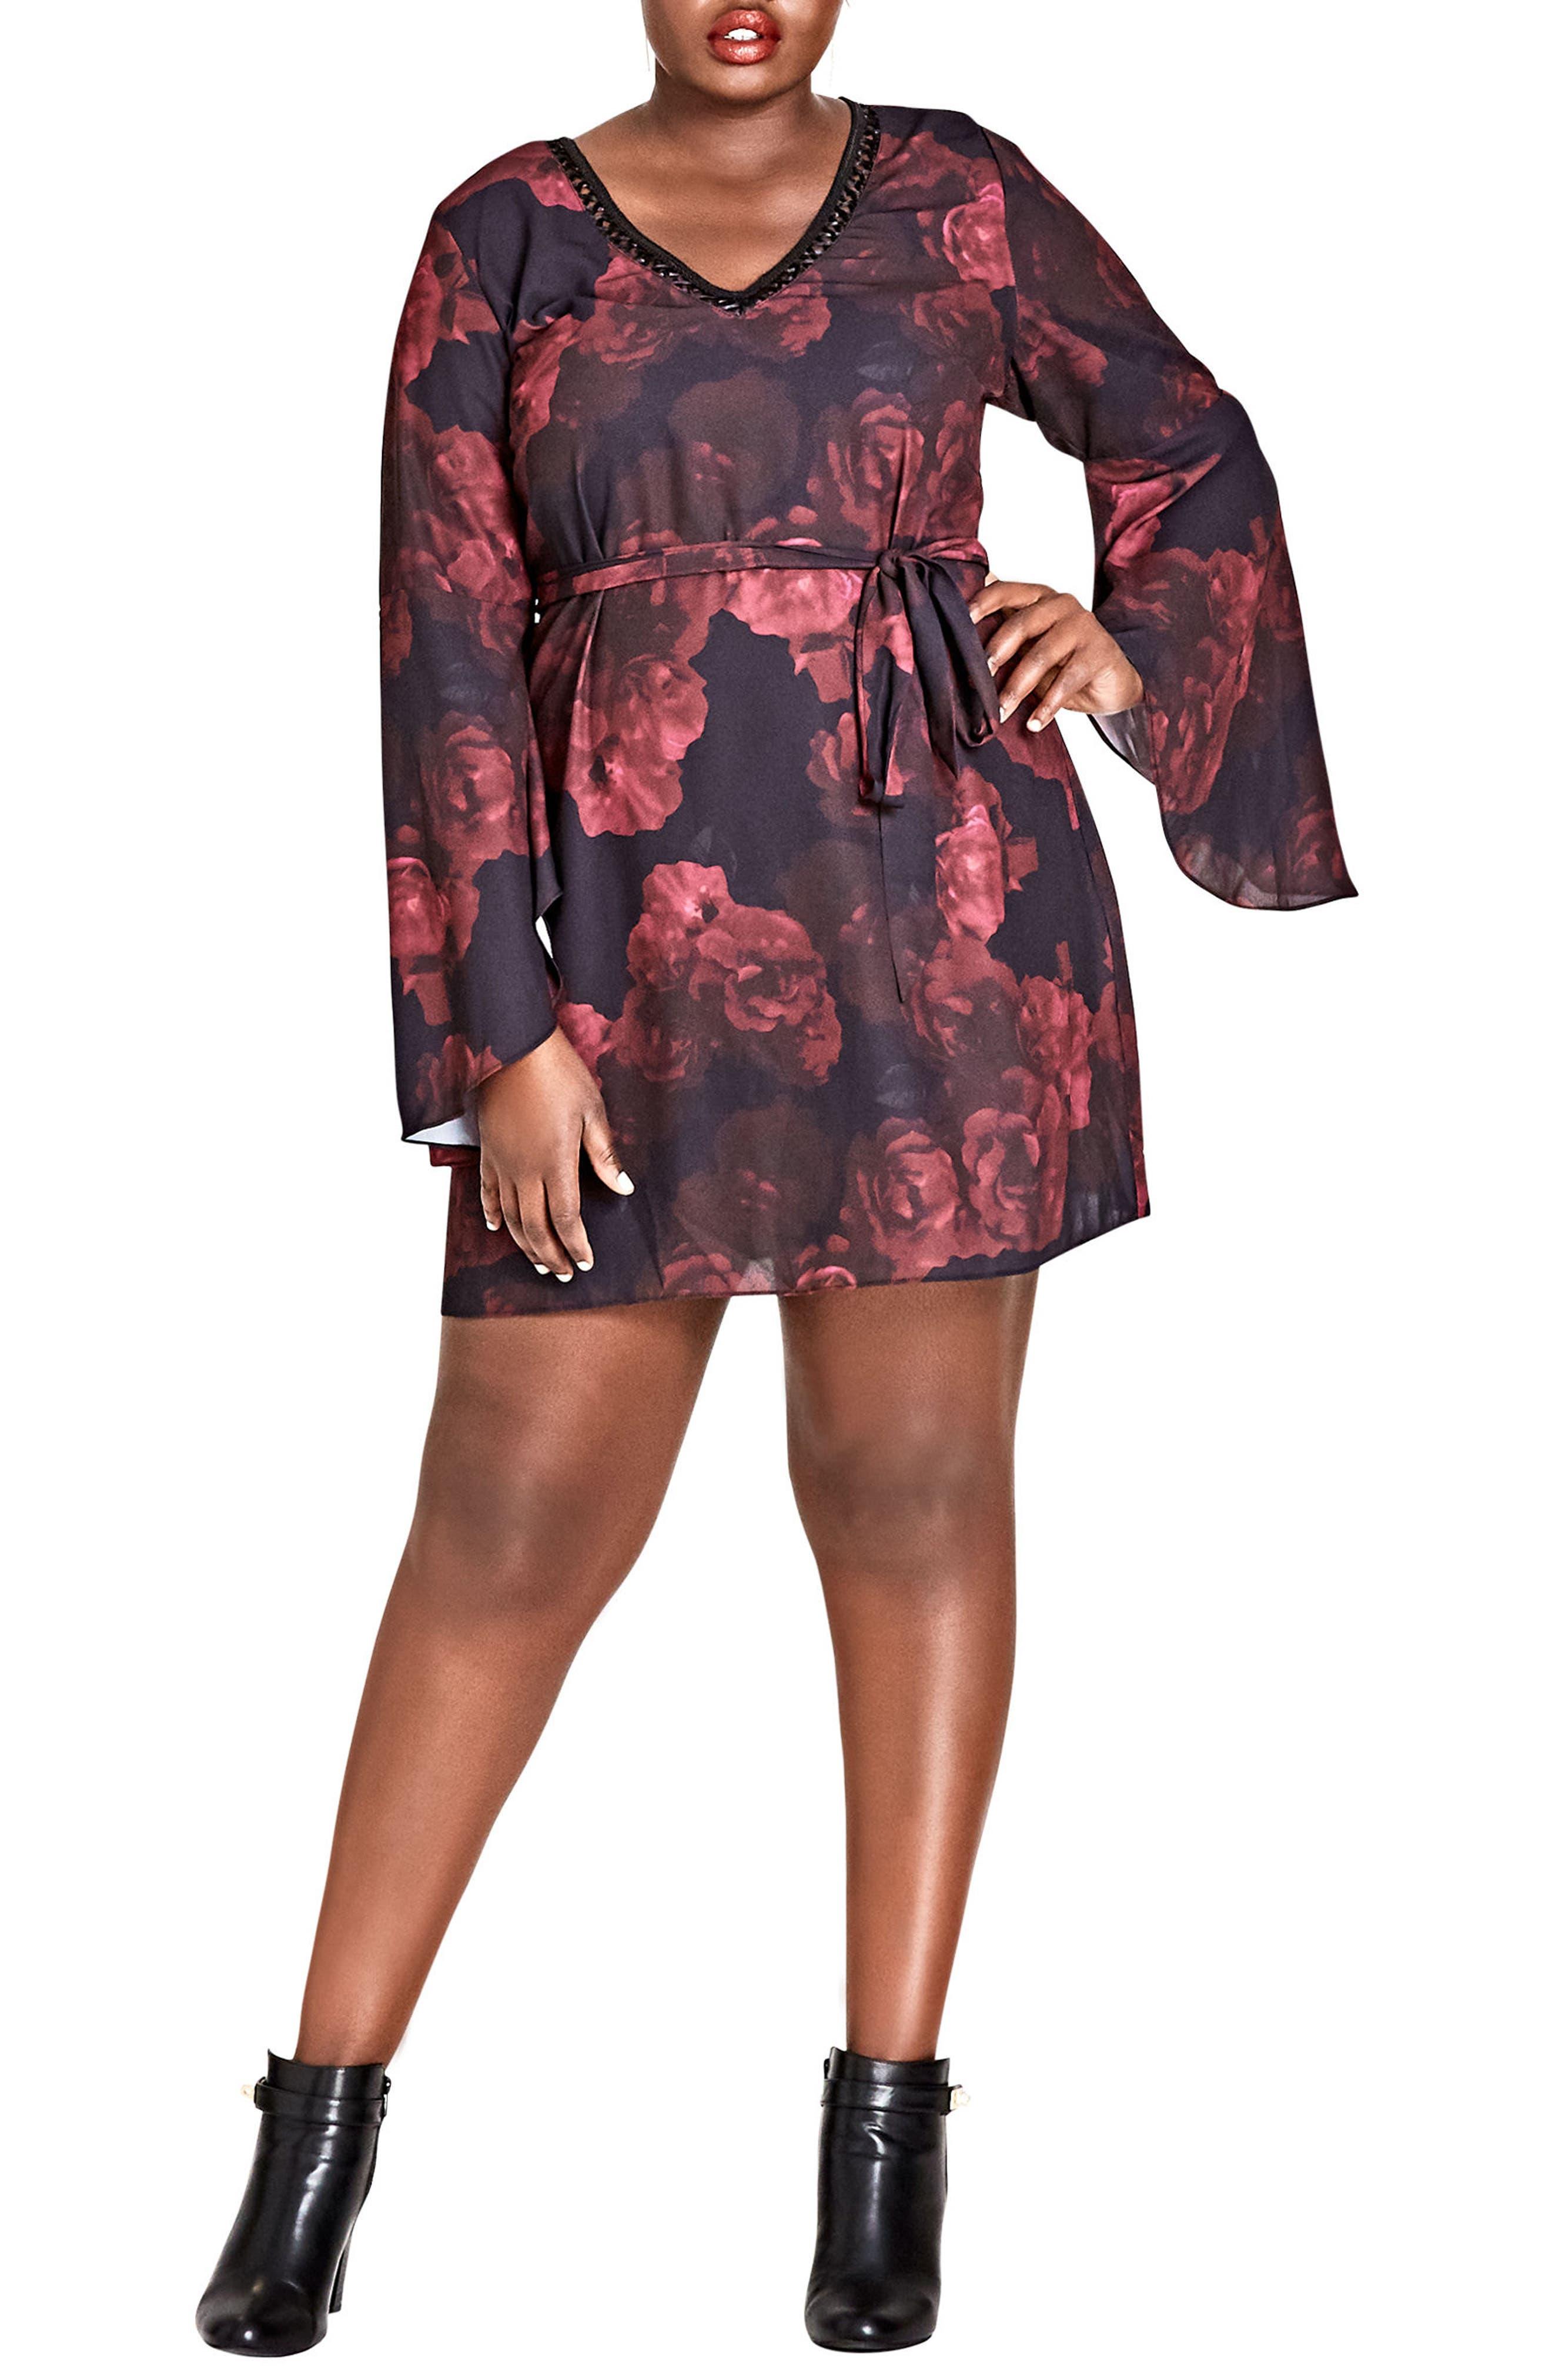 Plus Size City Chic Crimson Rose Tunic Dress